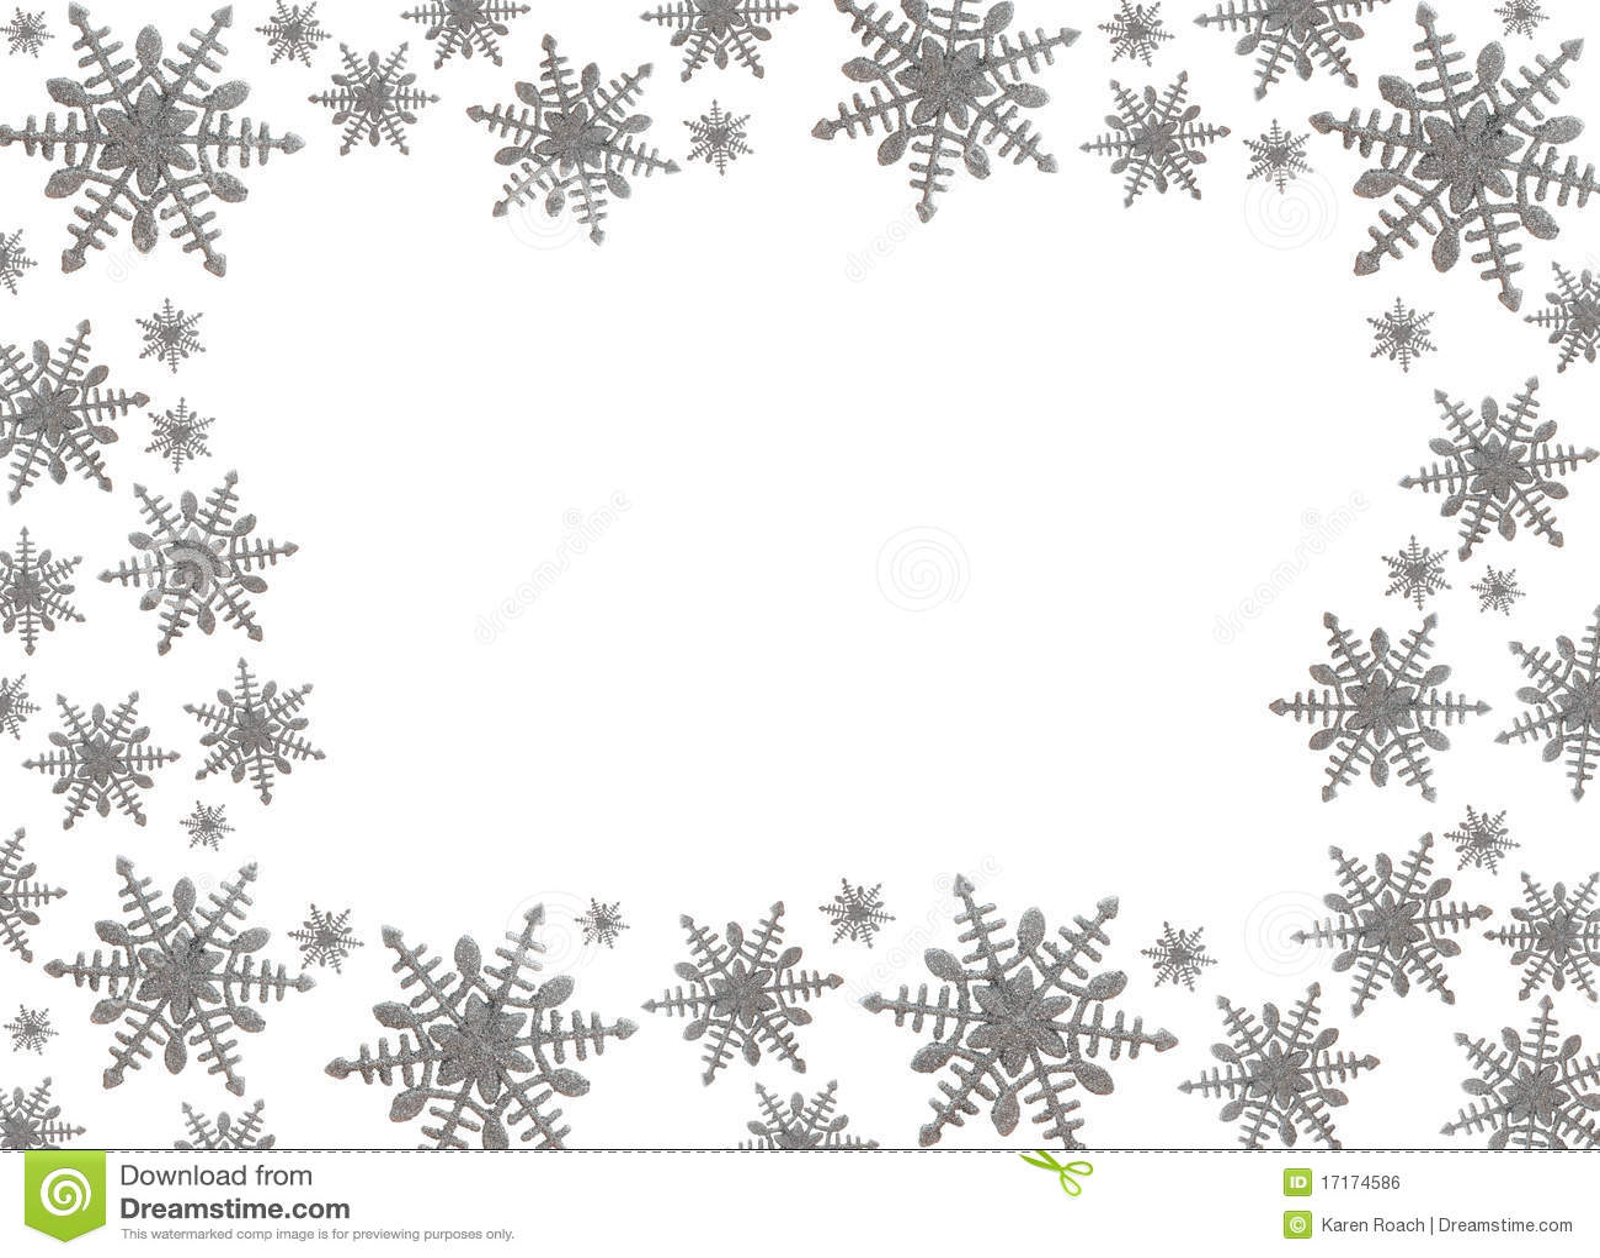 Snowflake Border Royalty Free Stock Image - Image: 17174586